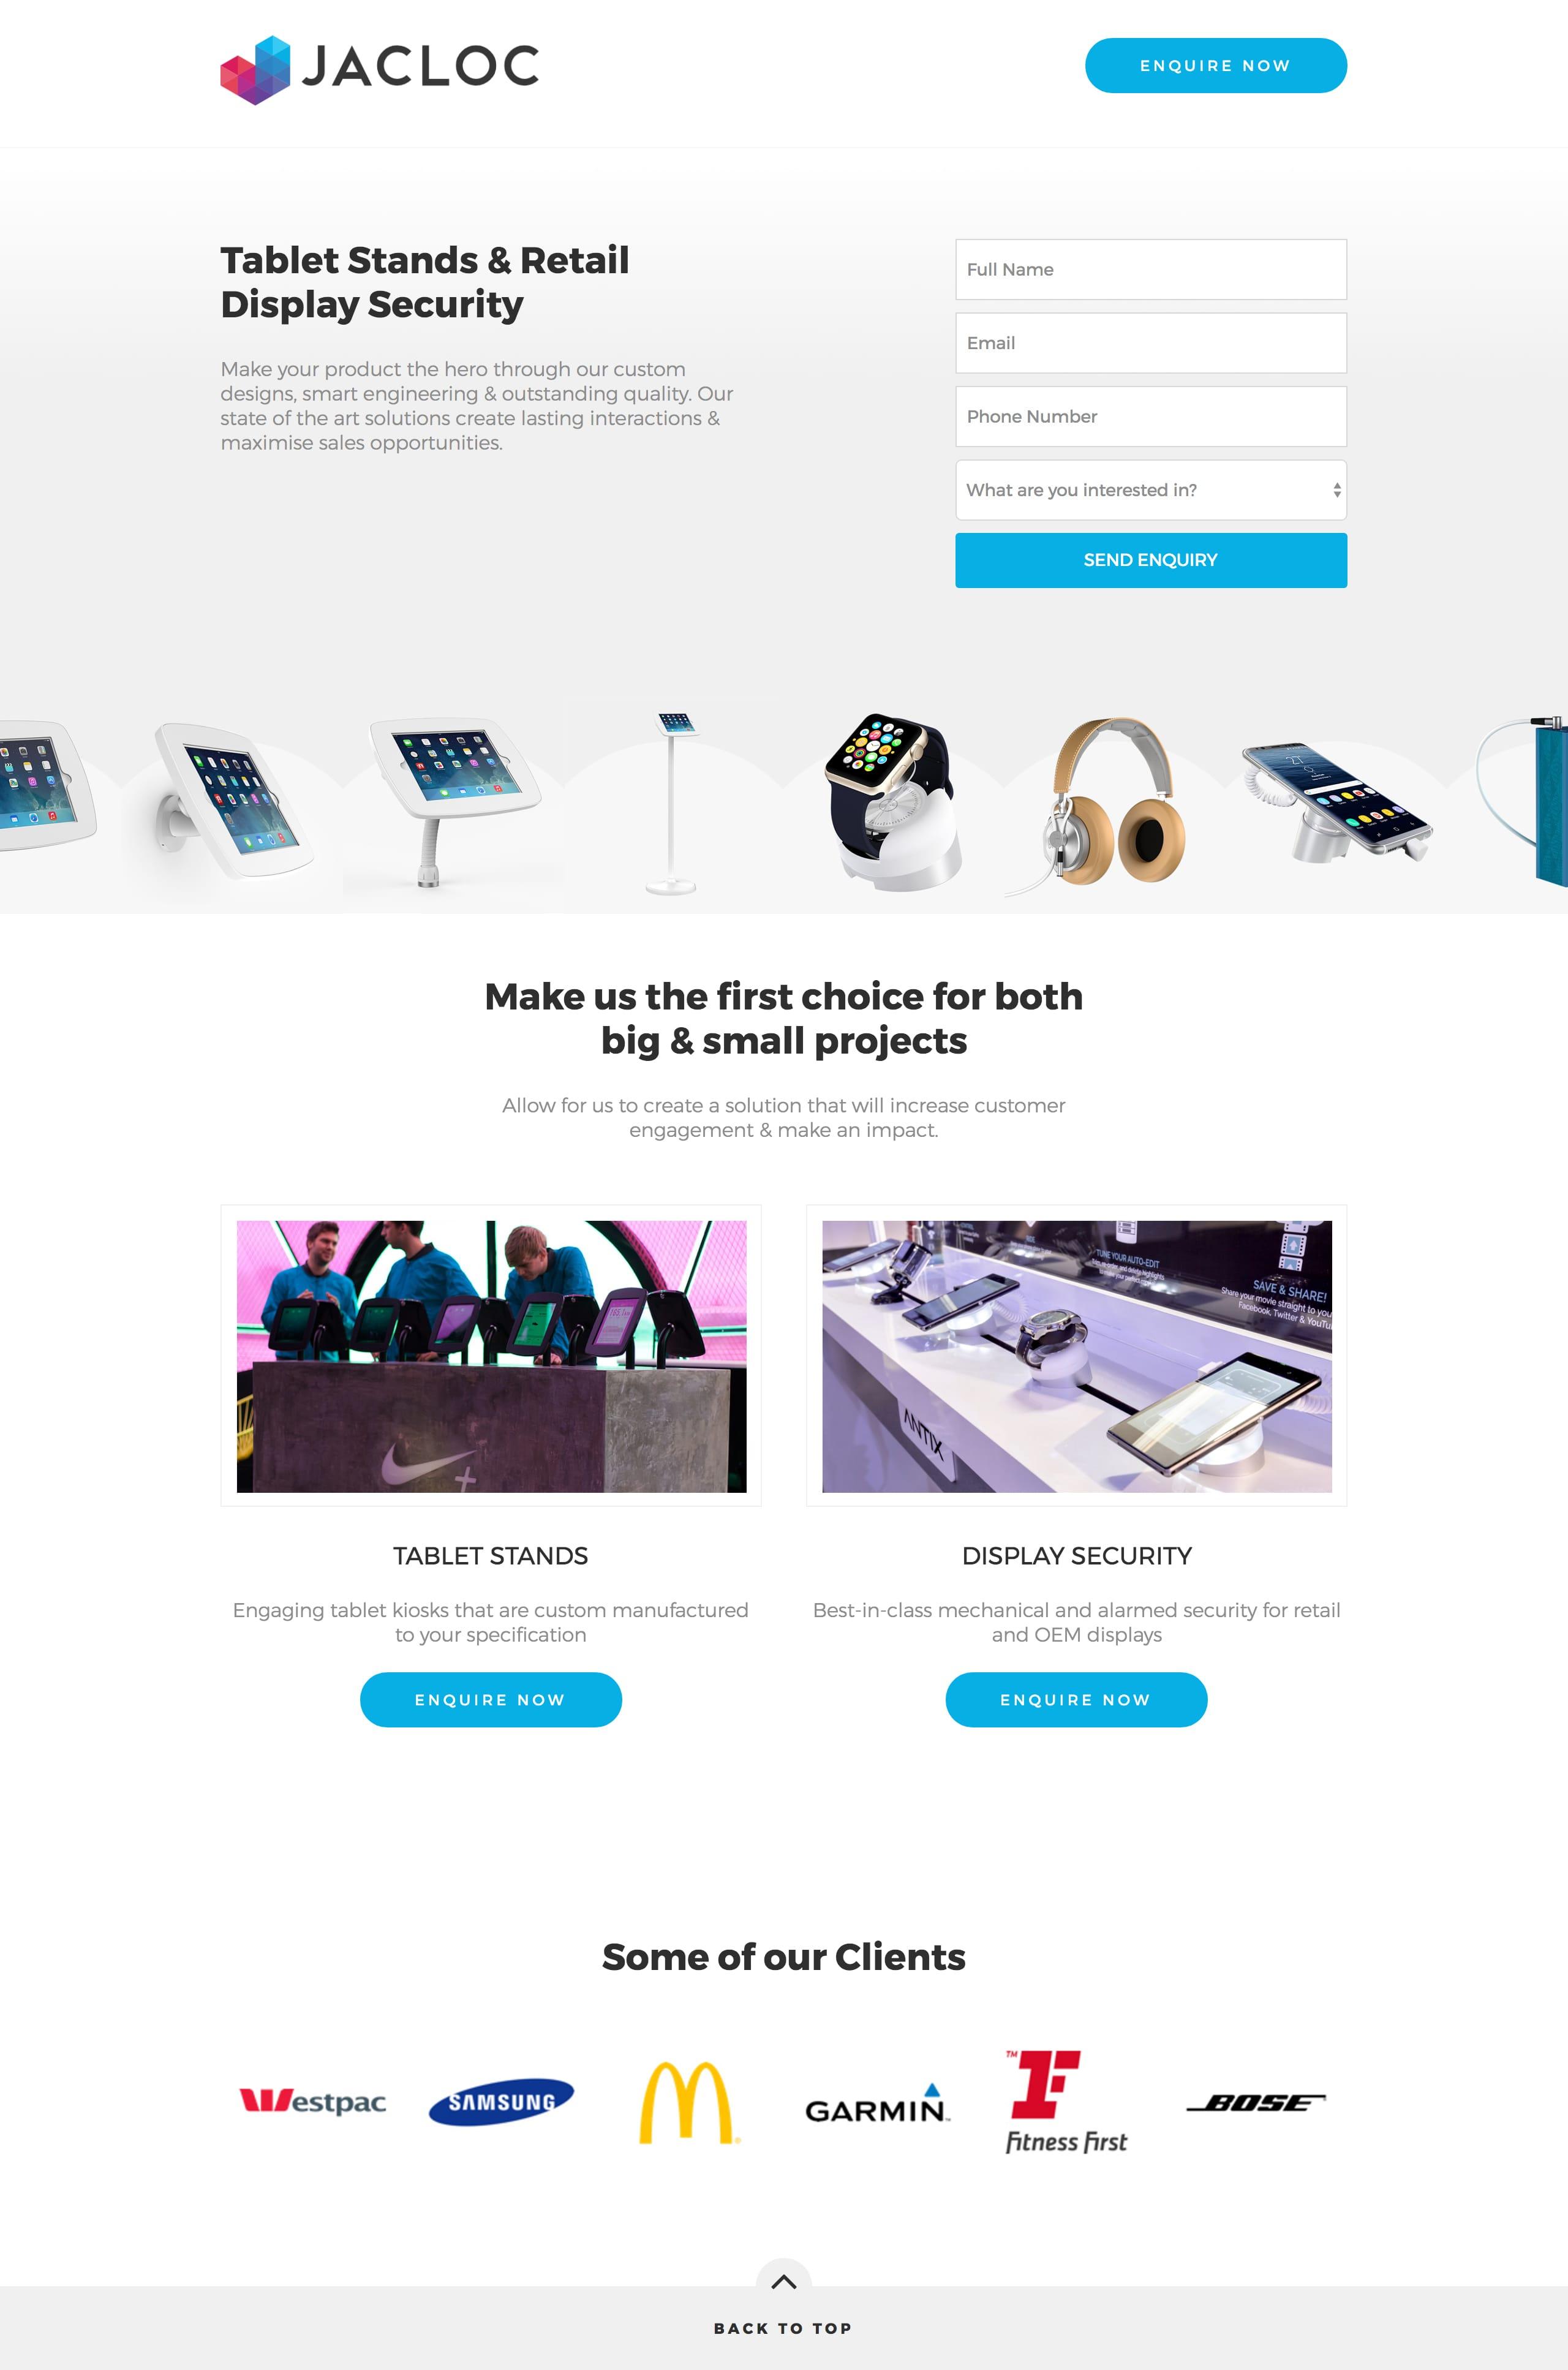 Jacloc Website Screenshot